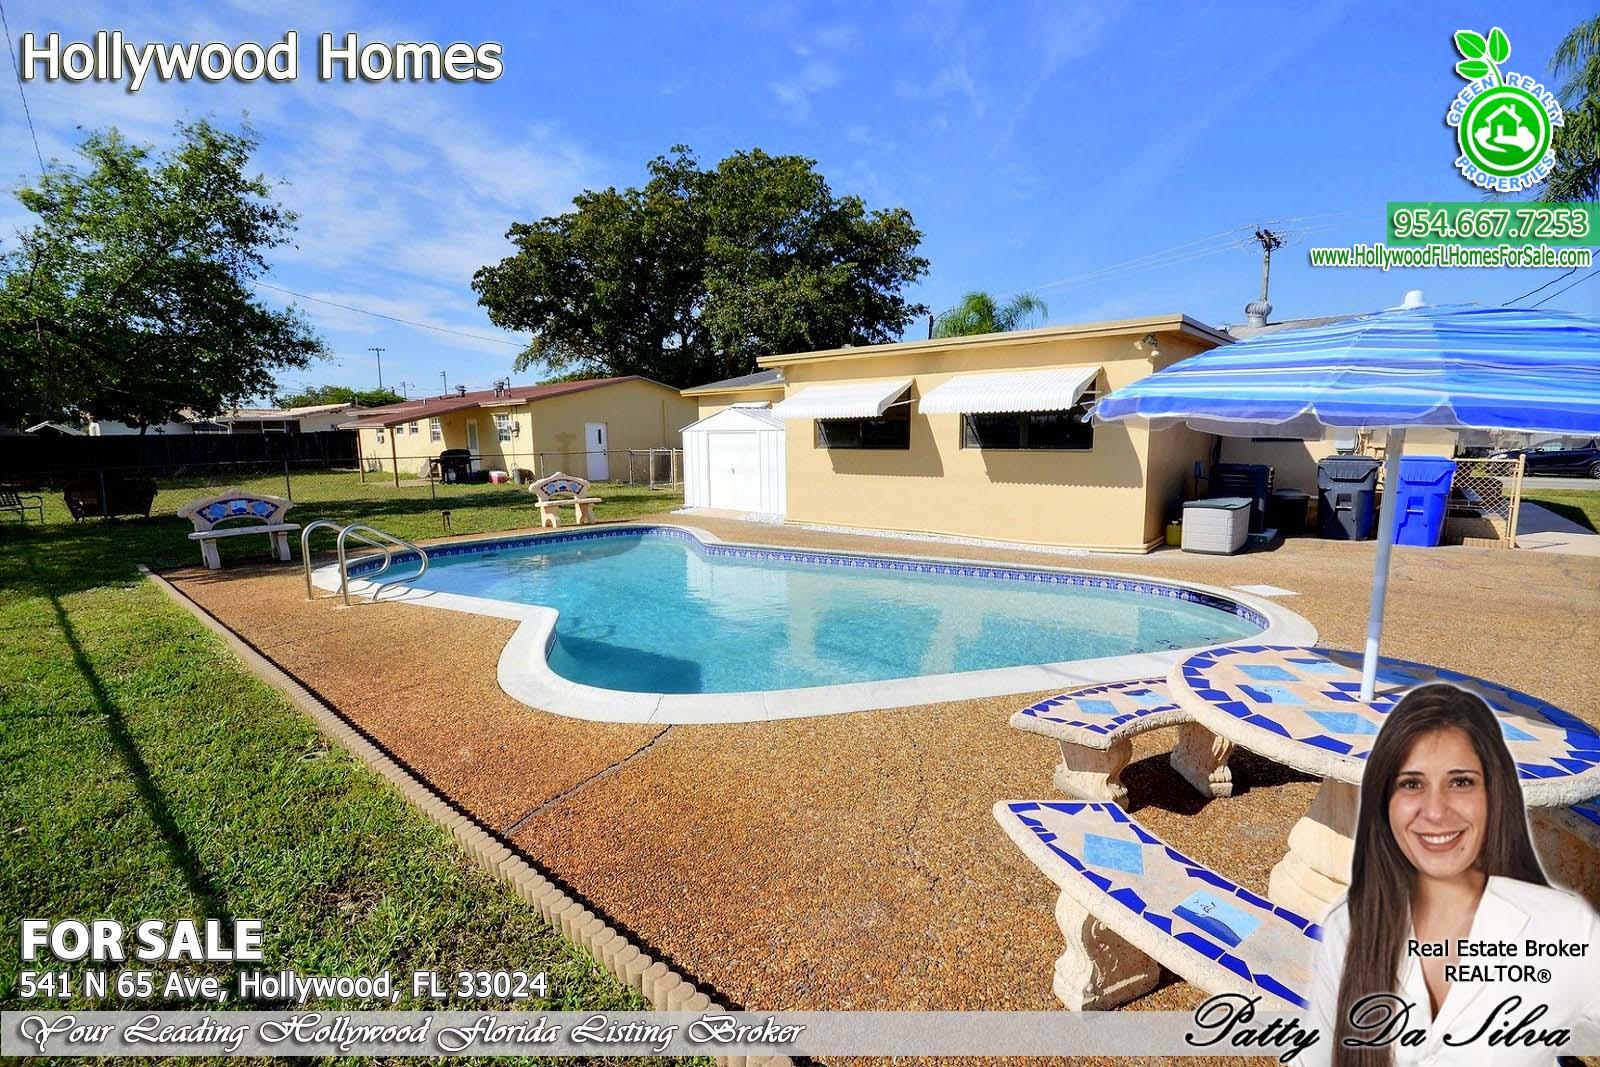 Hollywood Florida real estate broker patty da silva green realty properties (2)